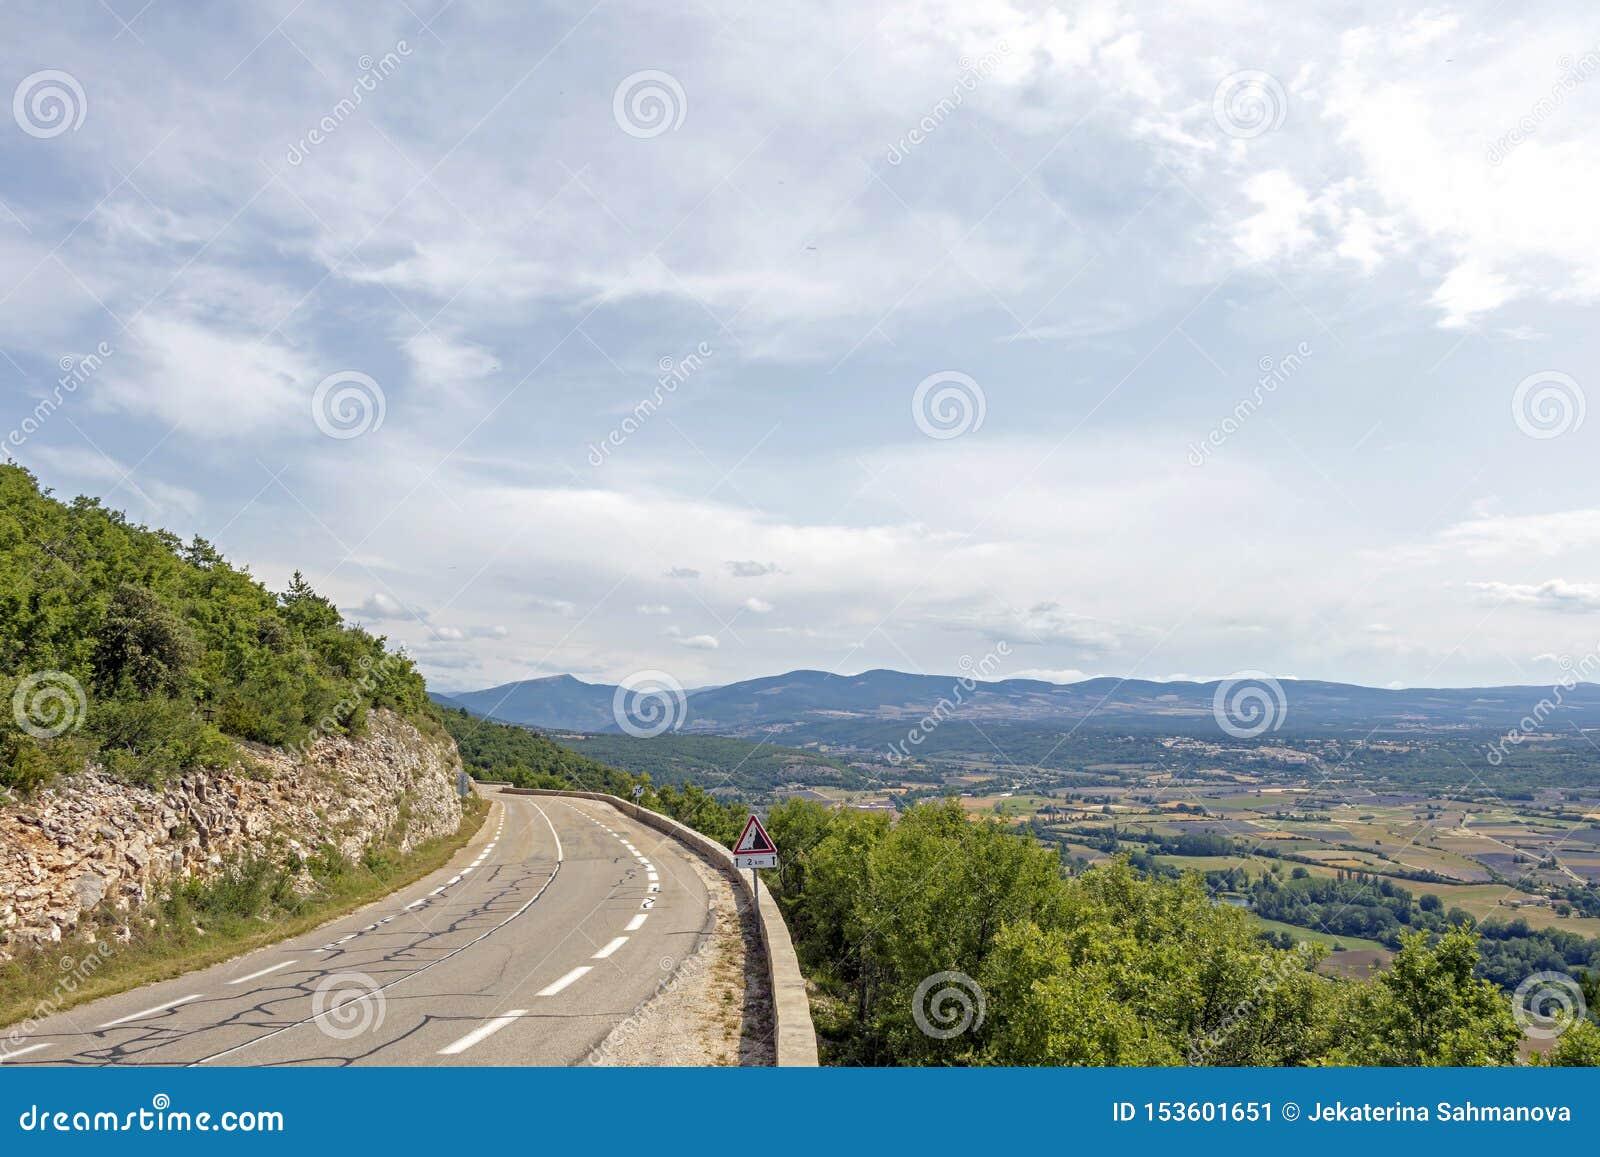 De kromme van de bergweg boven de bos en landbouwgebieden in Frans platteland